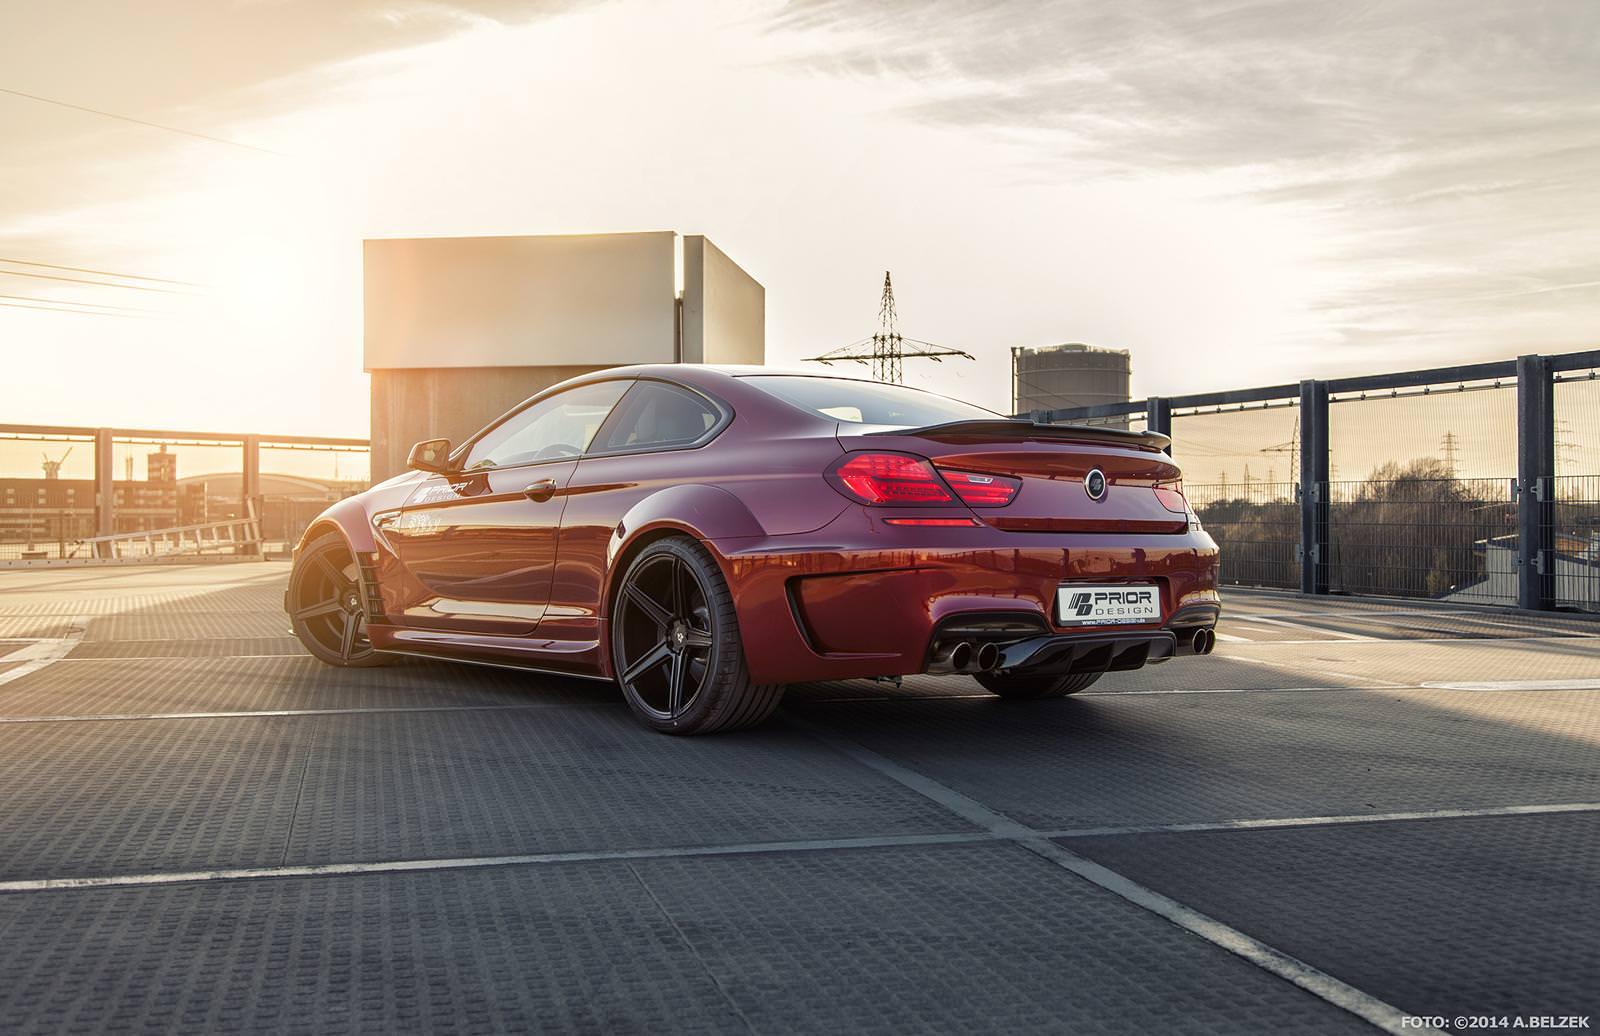 , BMW 6 Series / M6, Pitlane Tuning Shop